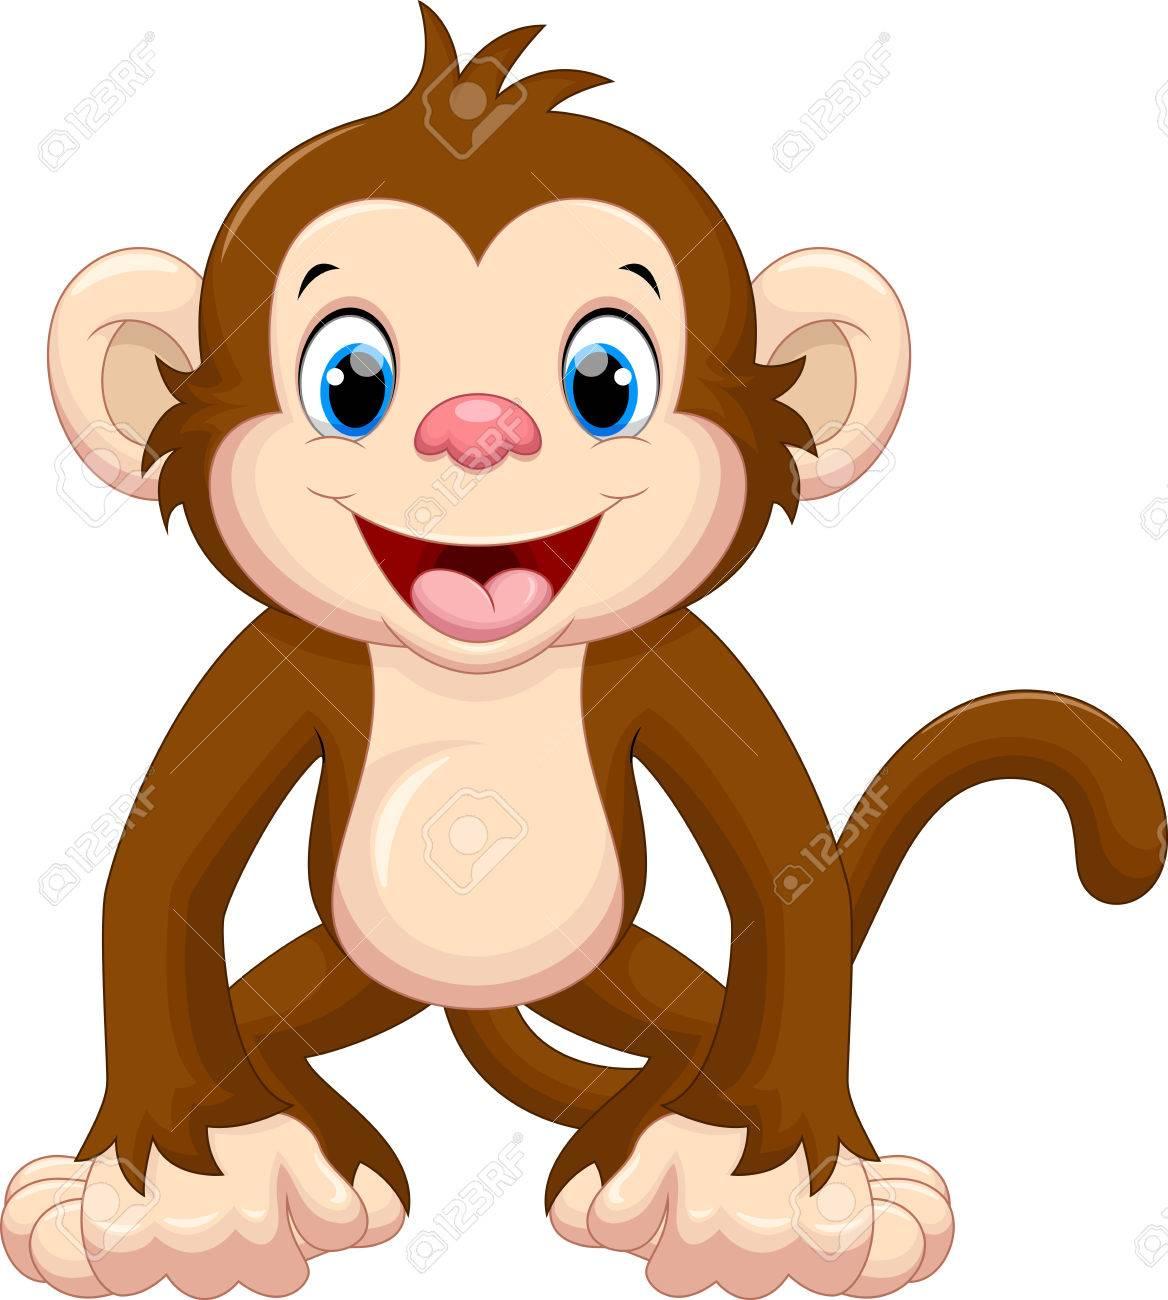 Cute monkey cartoon - 50993719